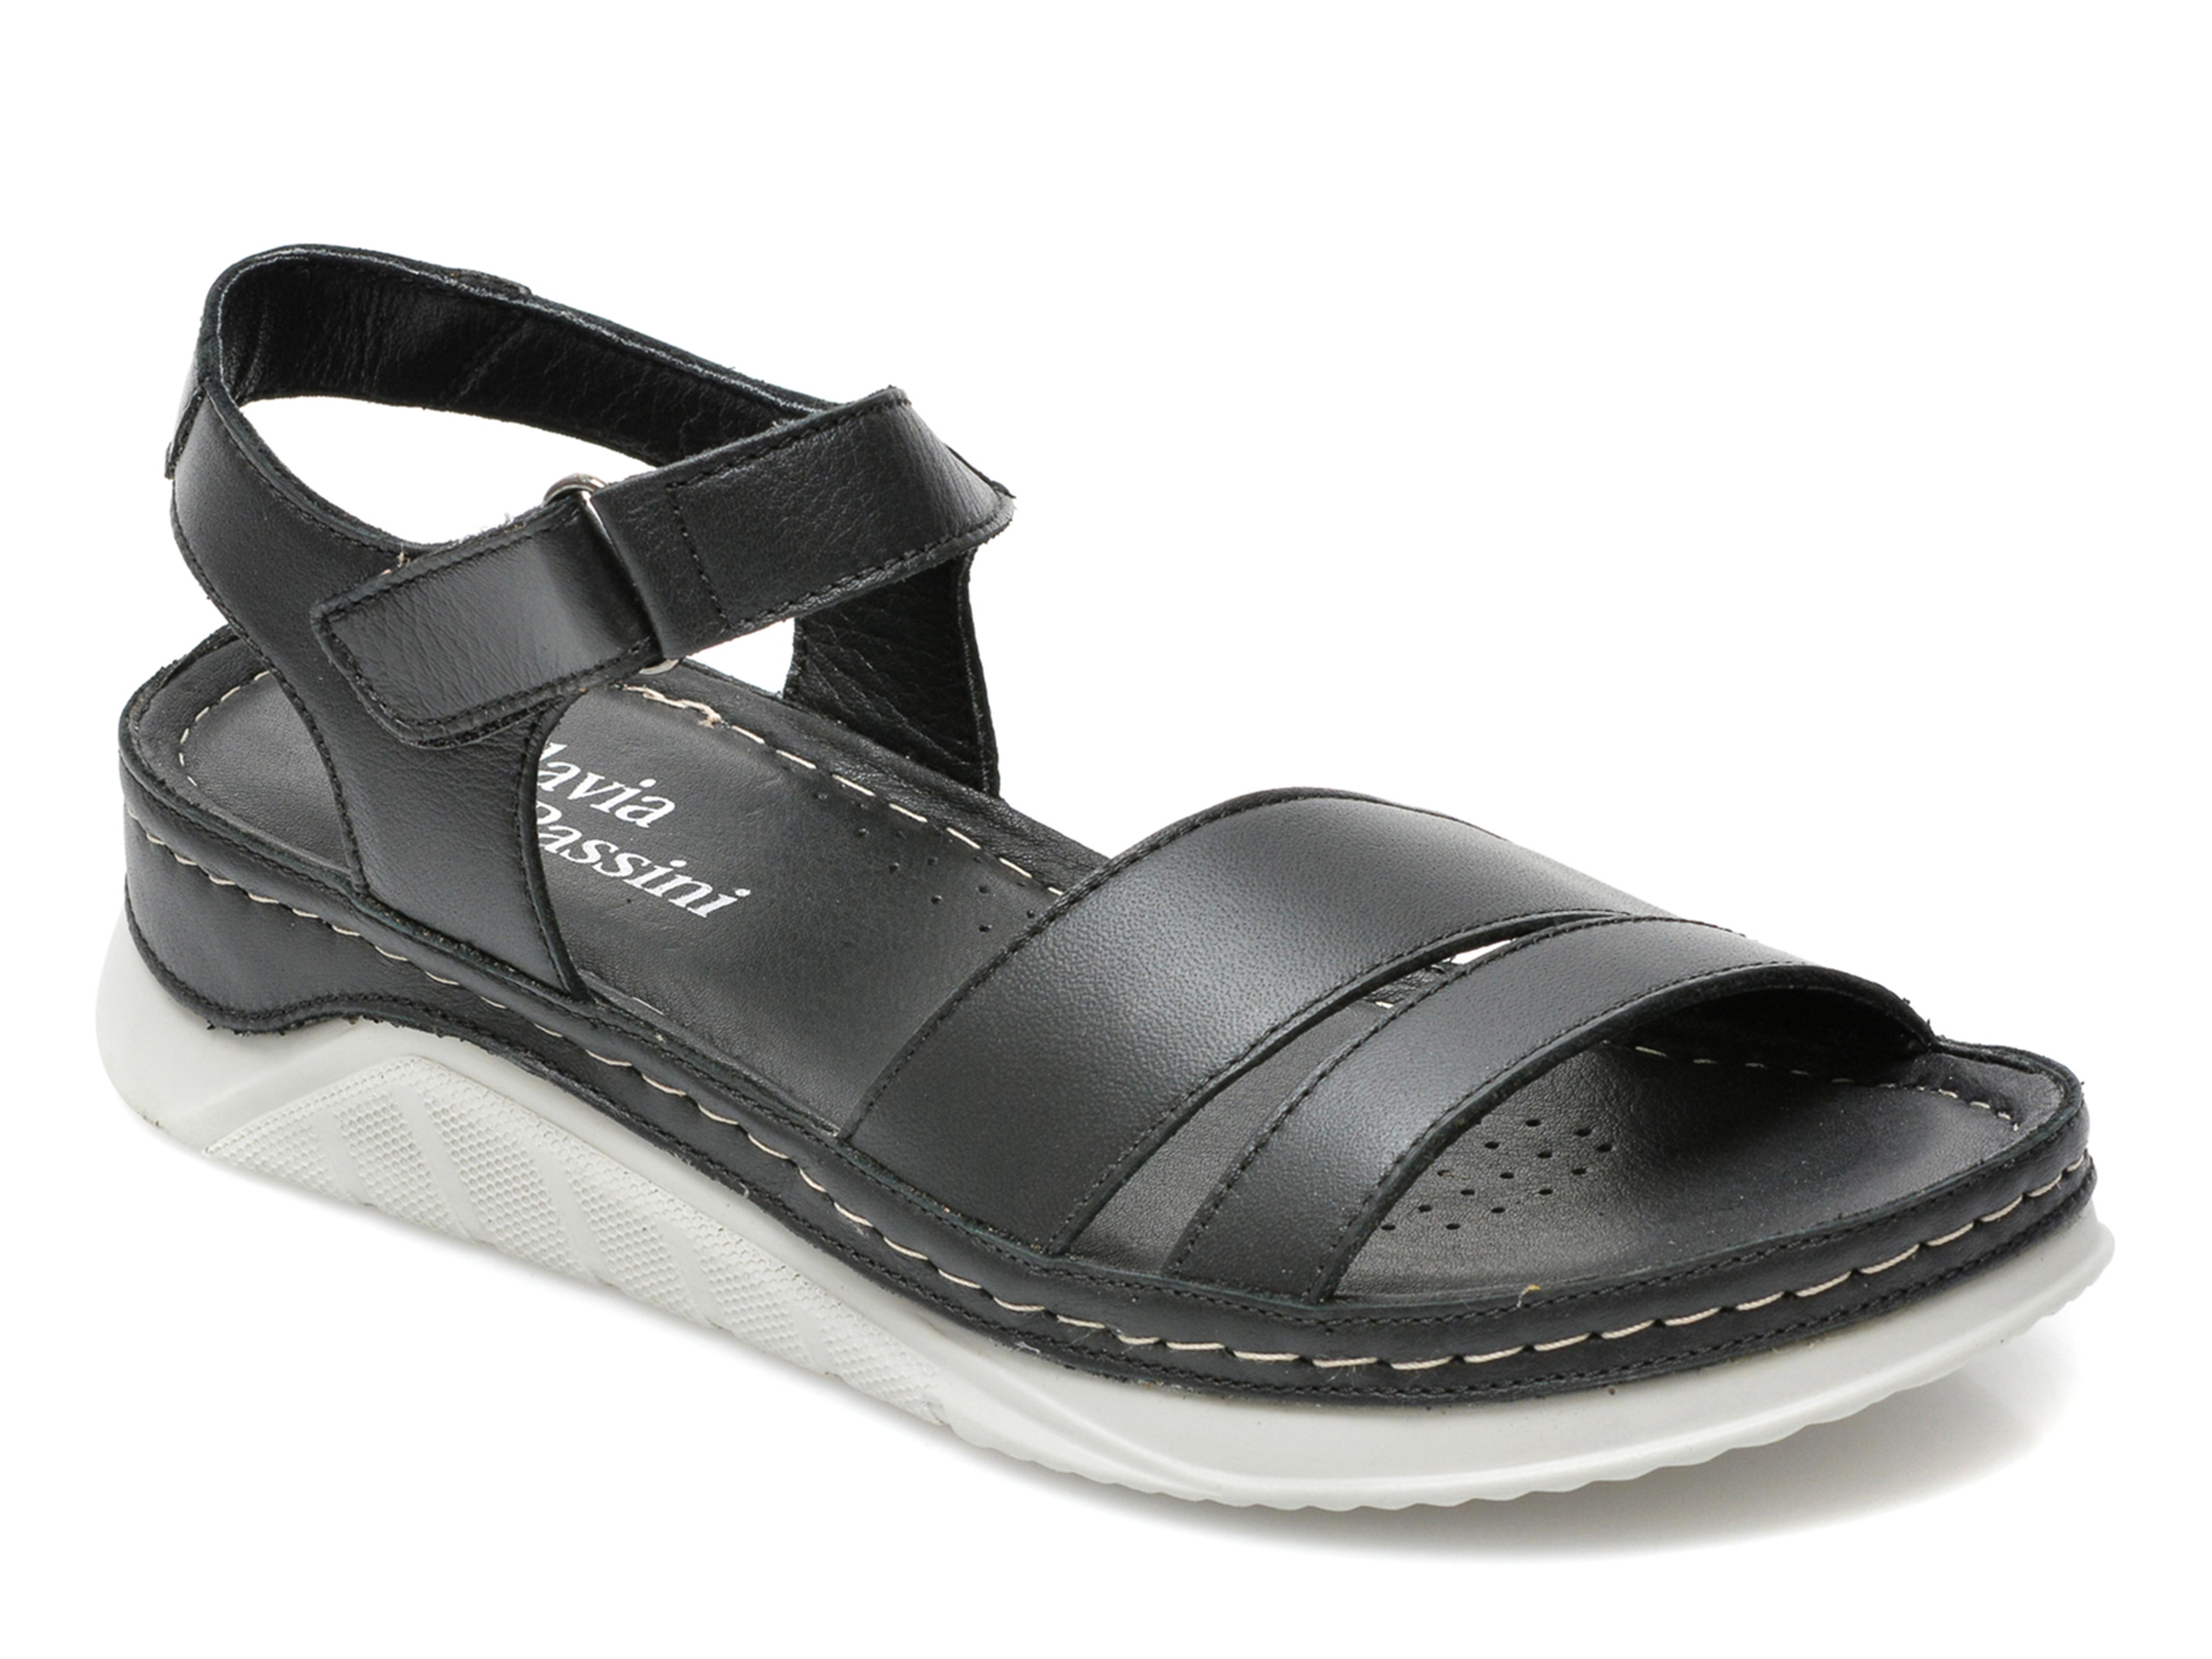 Sandale FLAVIA PASSINI negre, 2959, din piele naturala imagine 2021 Flavia Passini